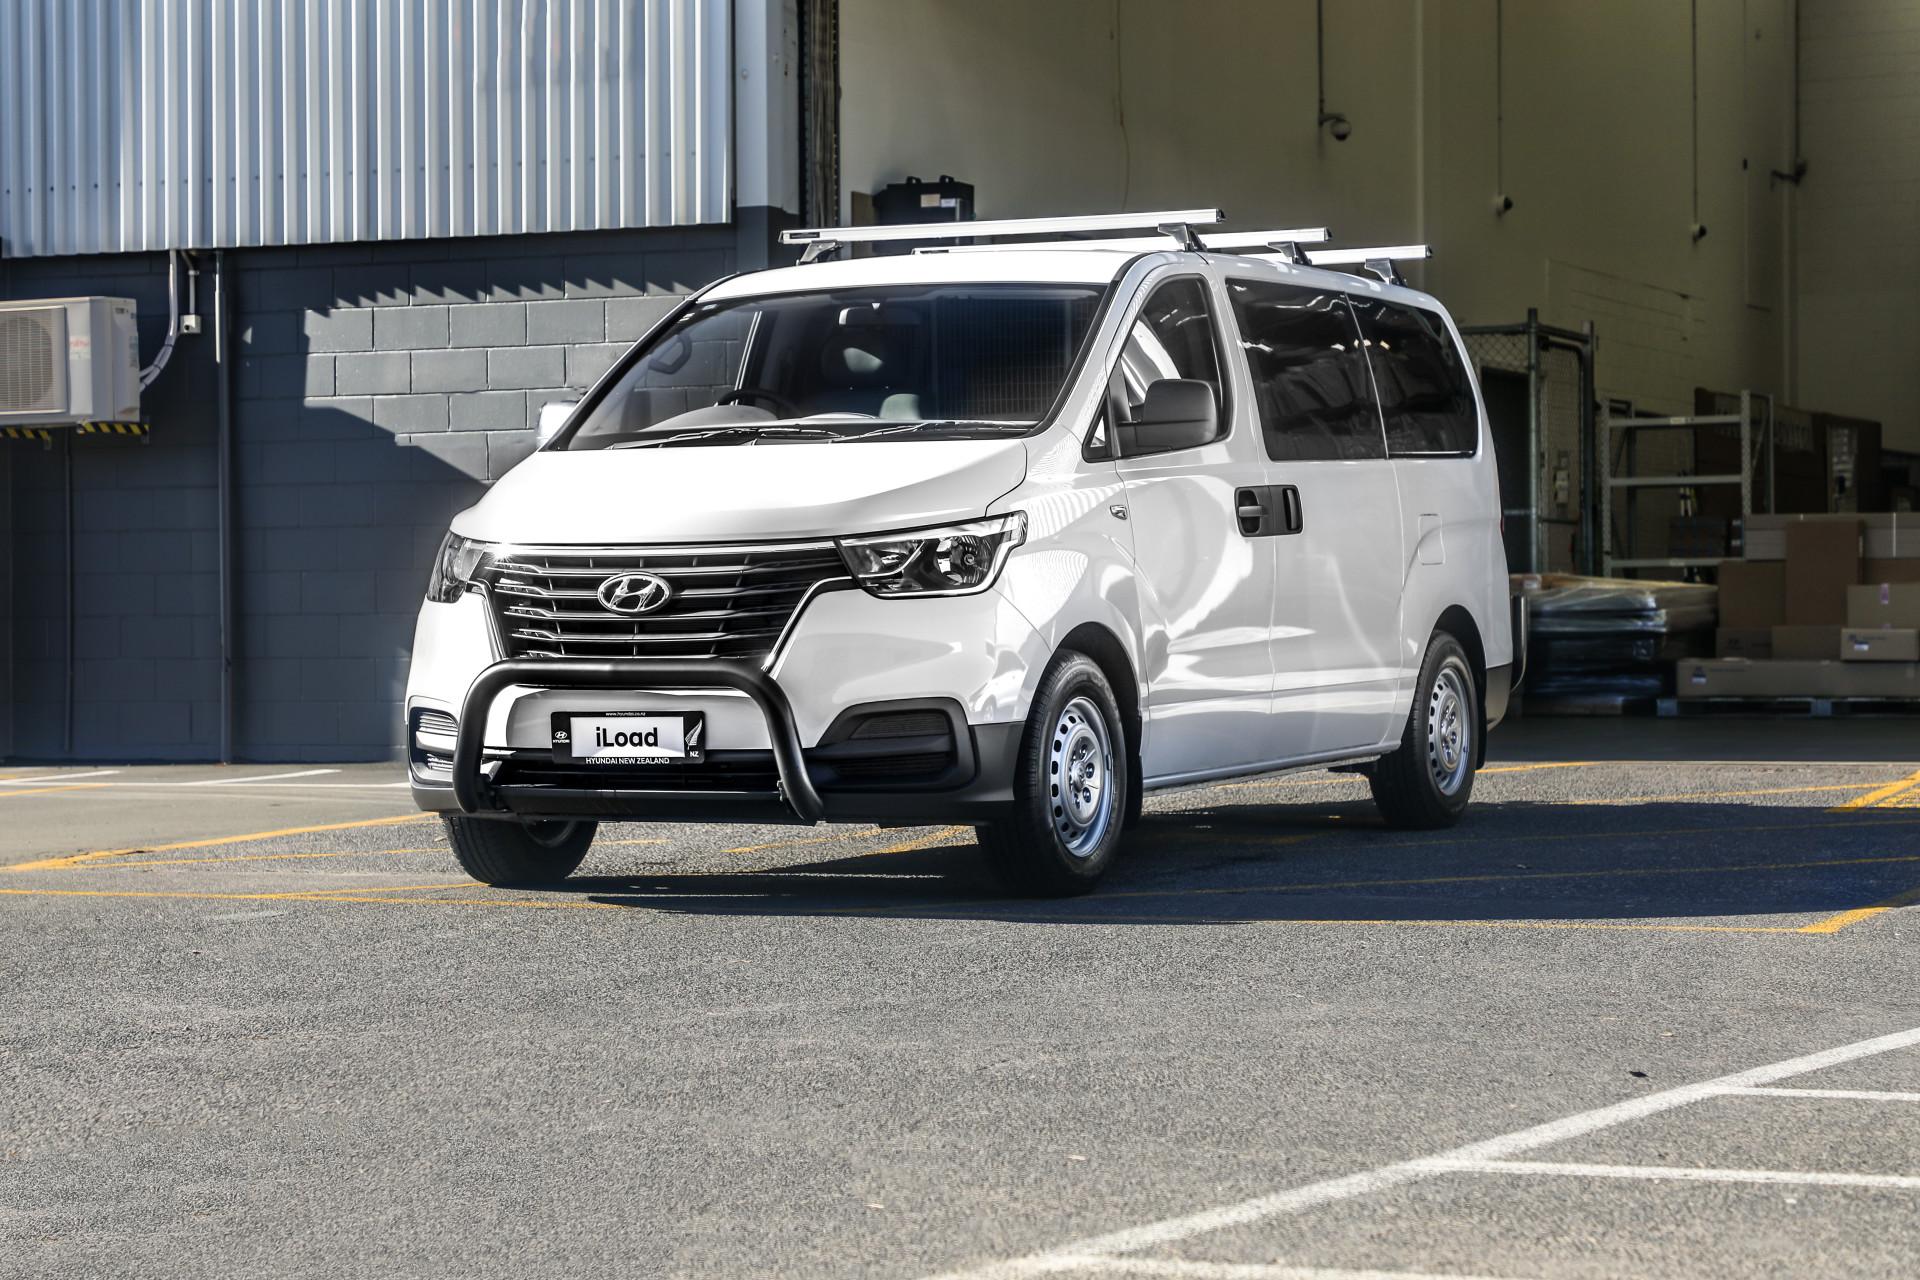 Iload Van Hyundai New Zealand